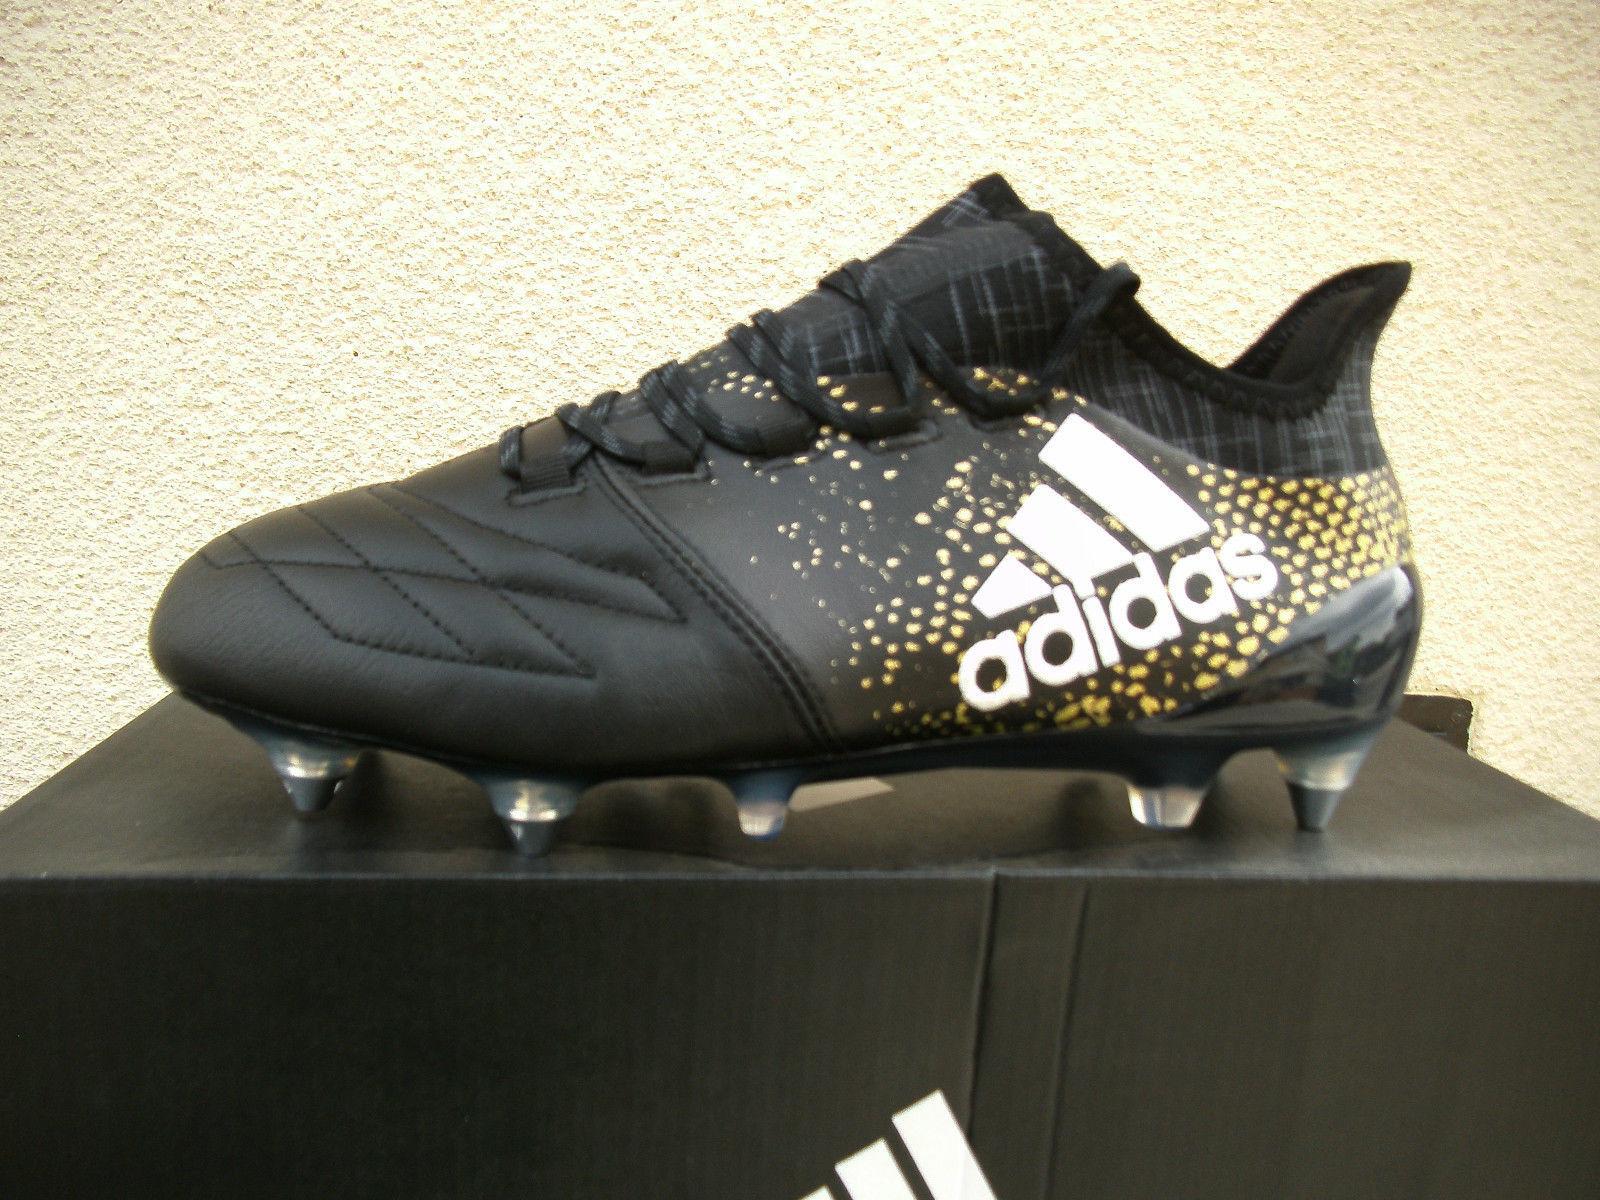 Details zu Adidas X16.1 SG Fussball Schuh Leder Stellar Leather schwarz gold UK 7 EU 40 23